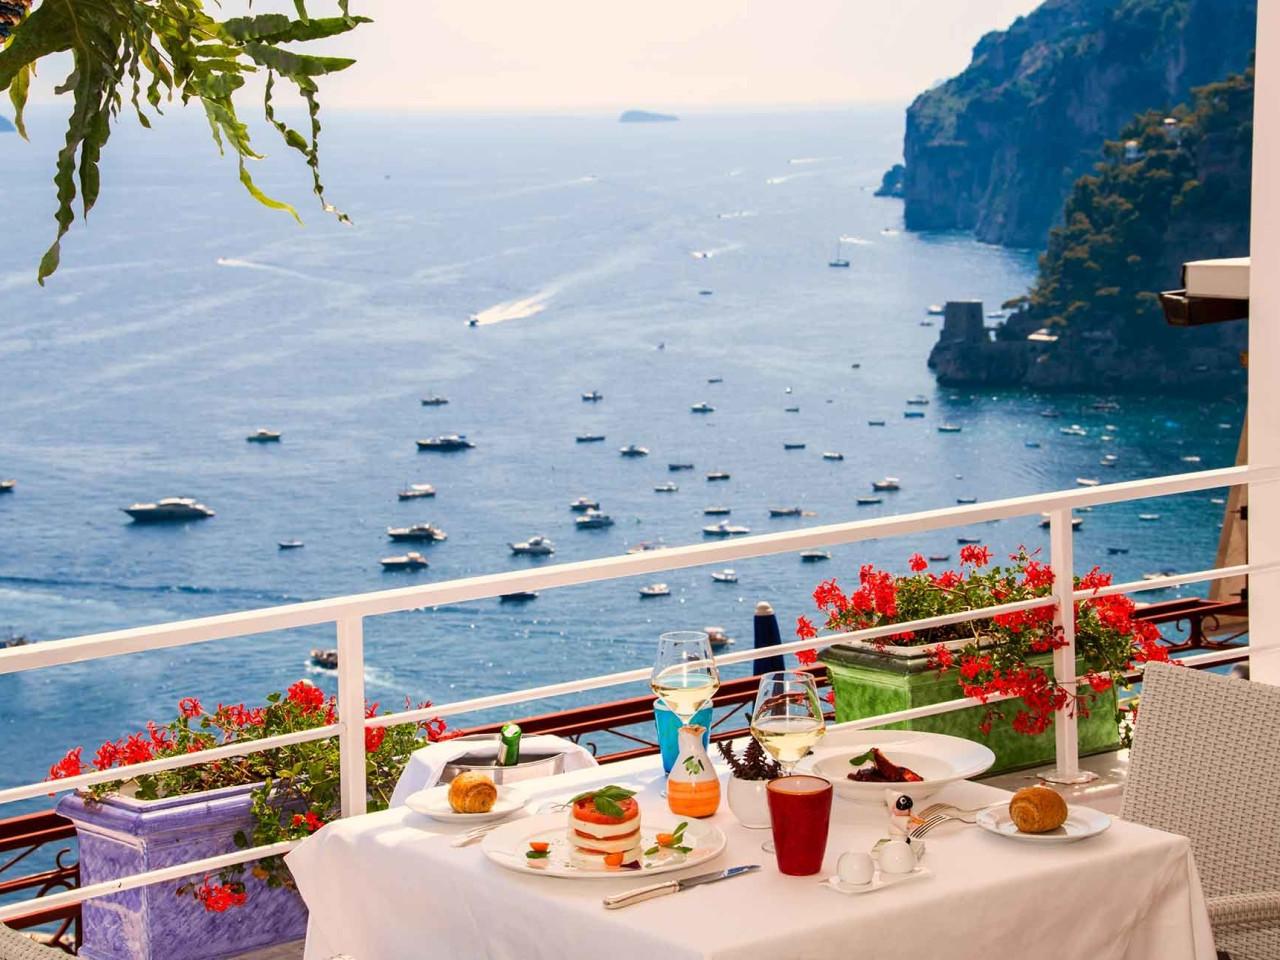 Weekend romantico a Positano - Travel Amalfi Coast